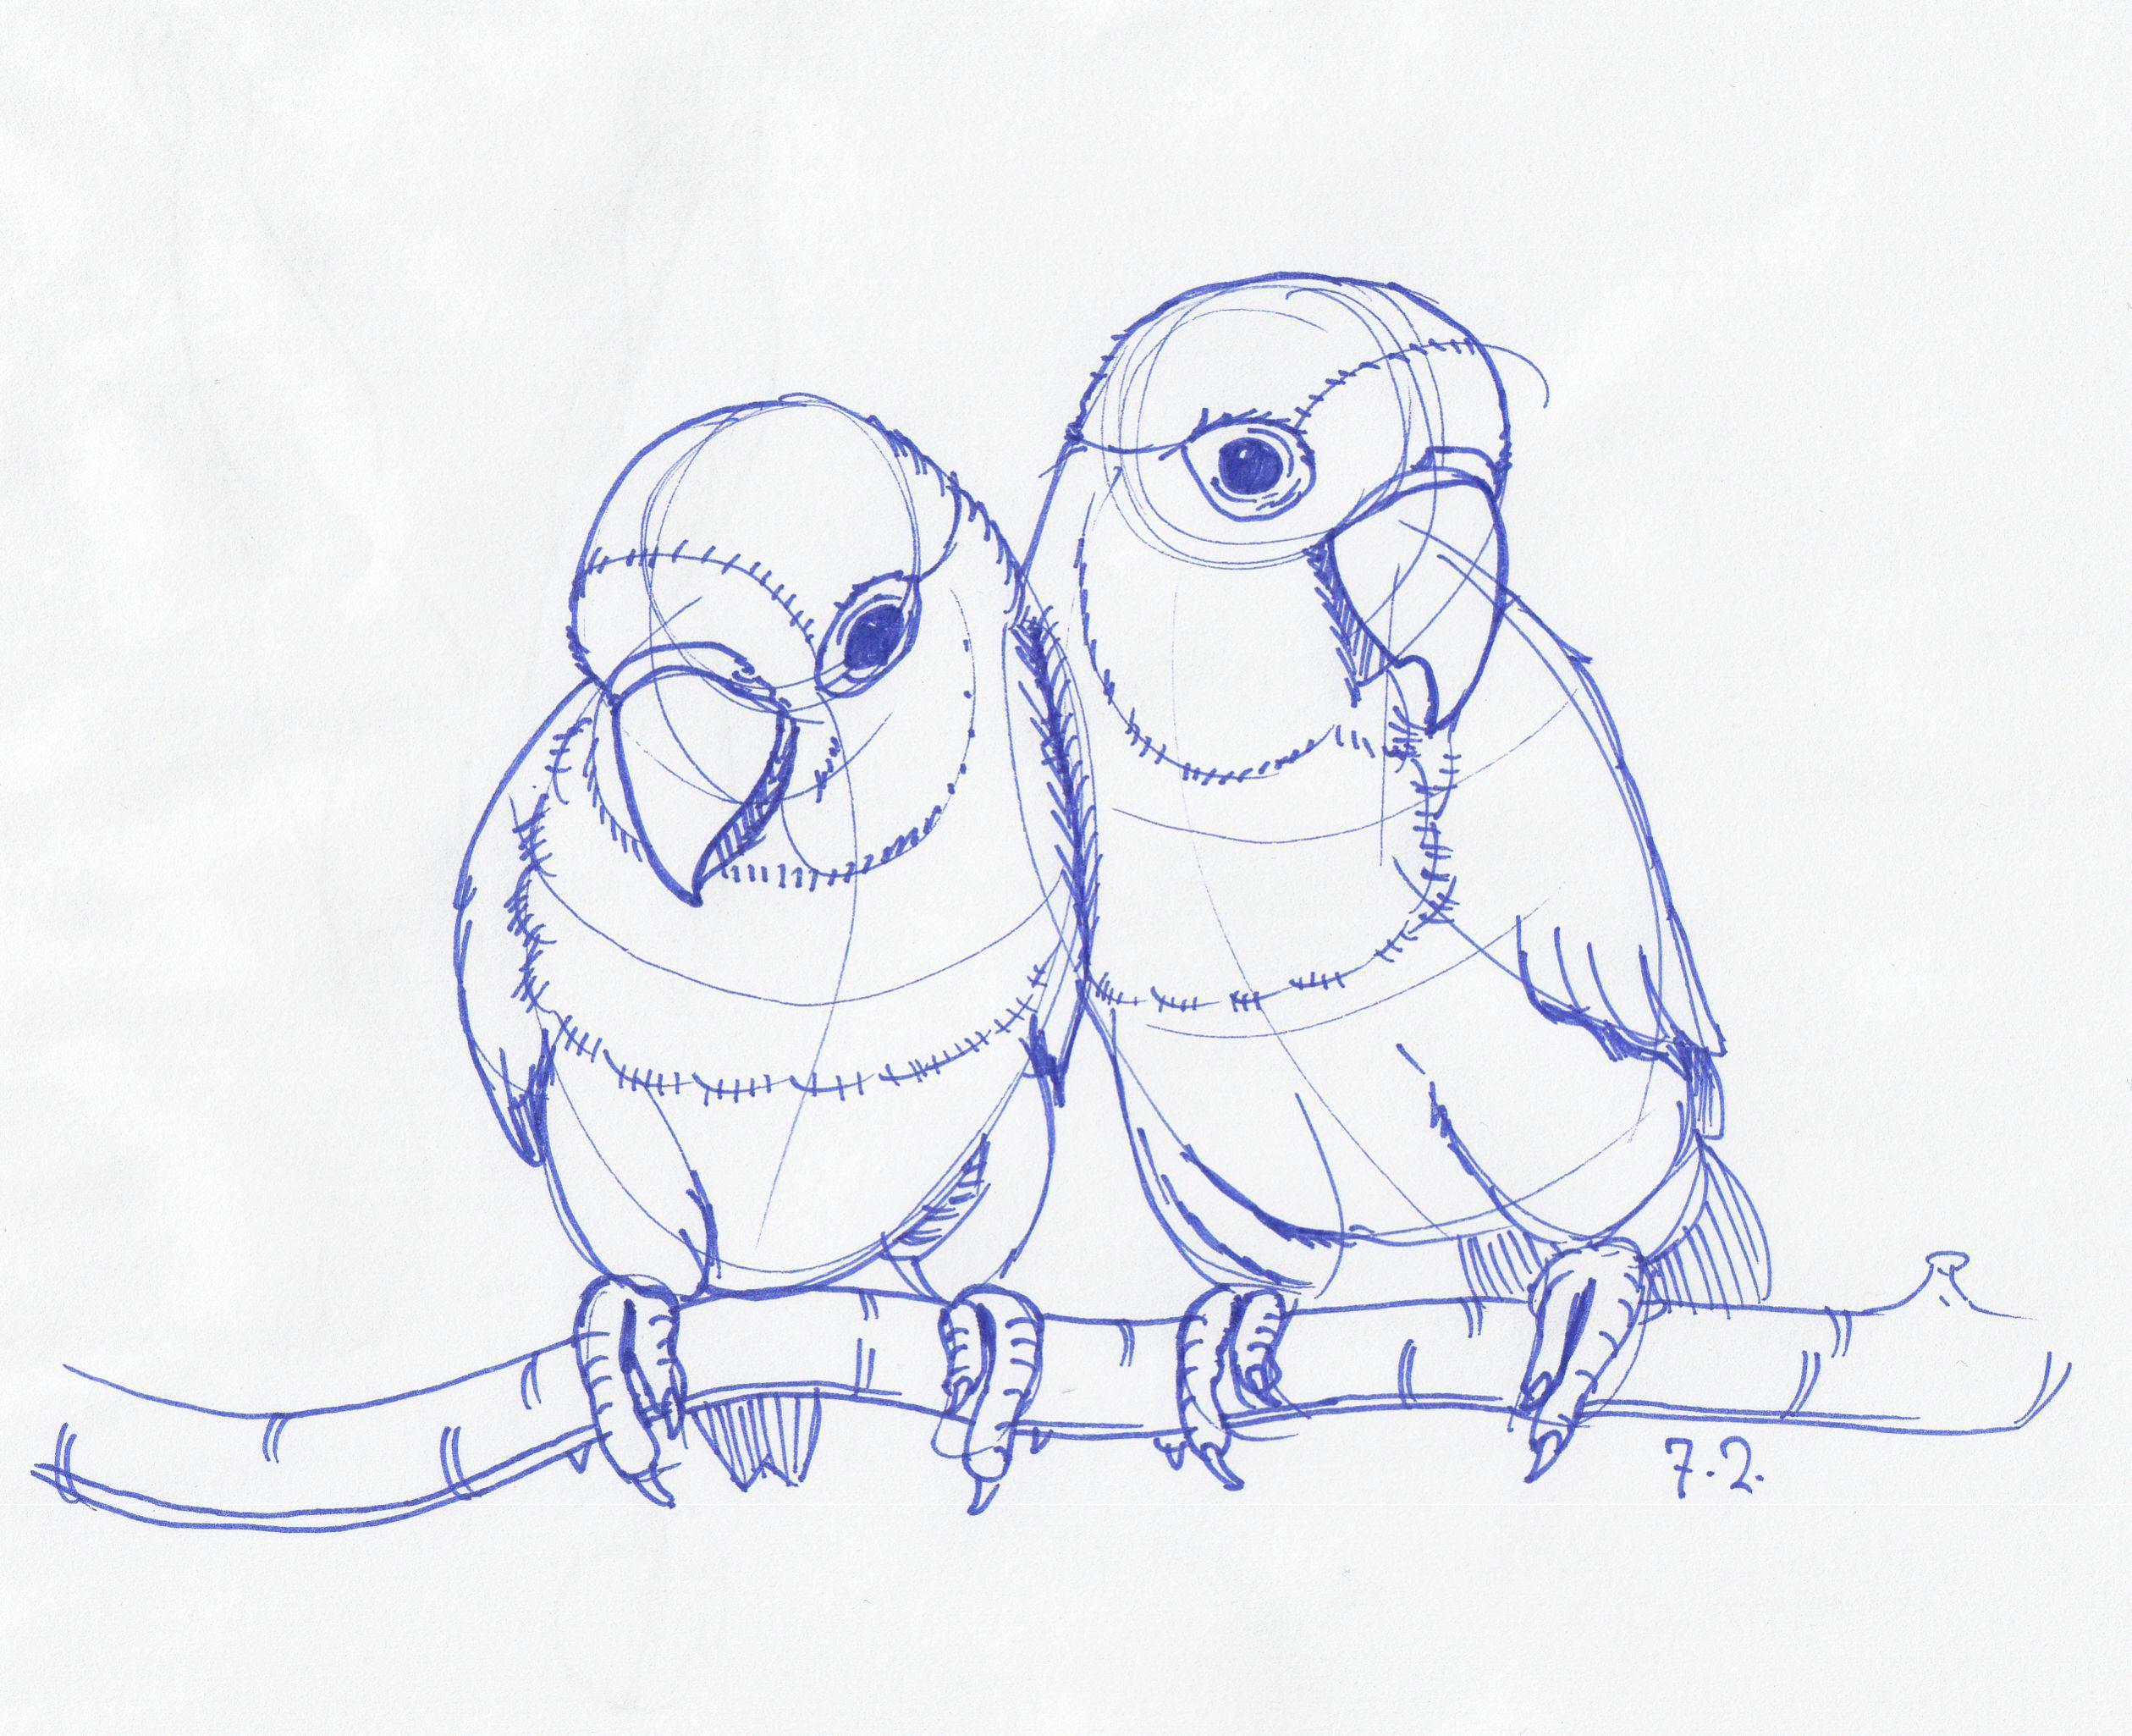 2519x2051 love birds sketch image beautiful love birds pencil images easy